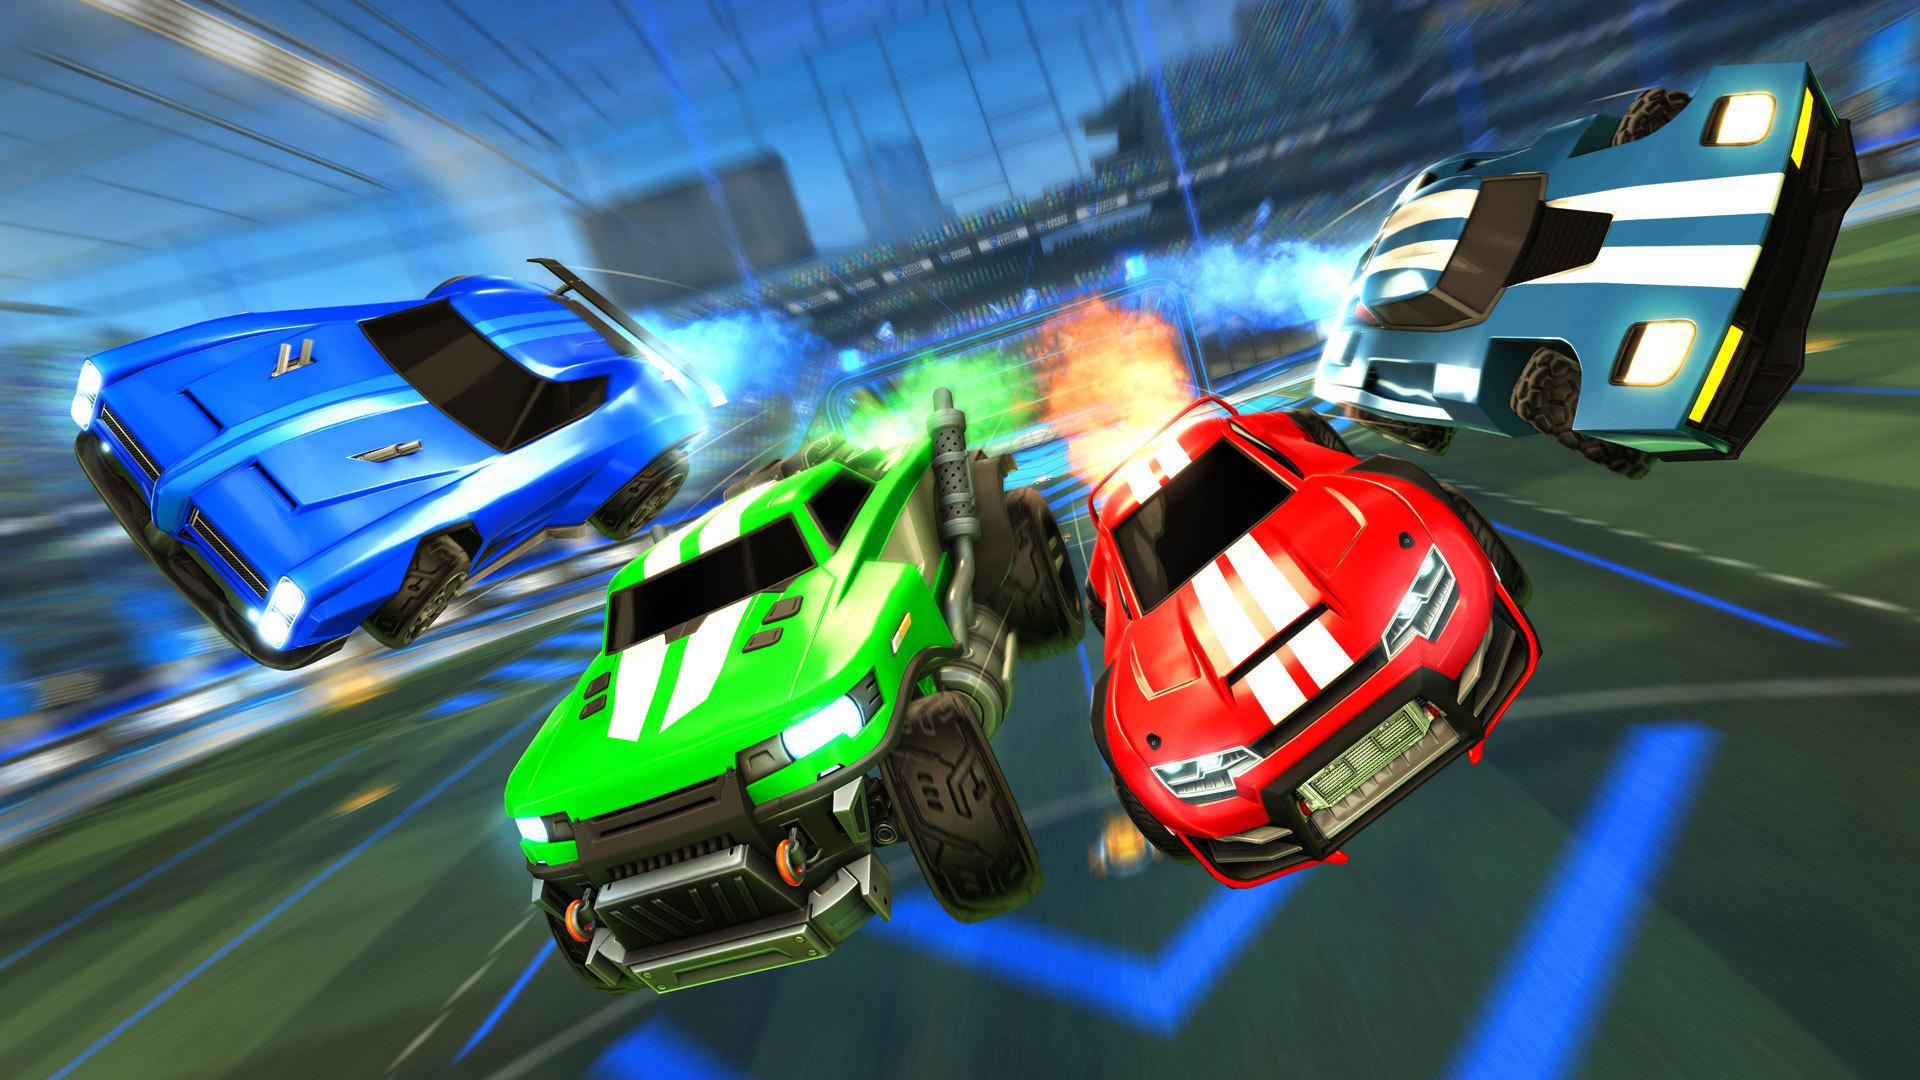 Rocket League cars flying